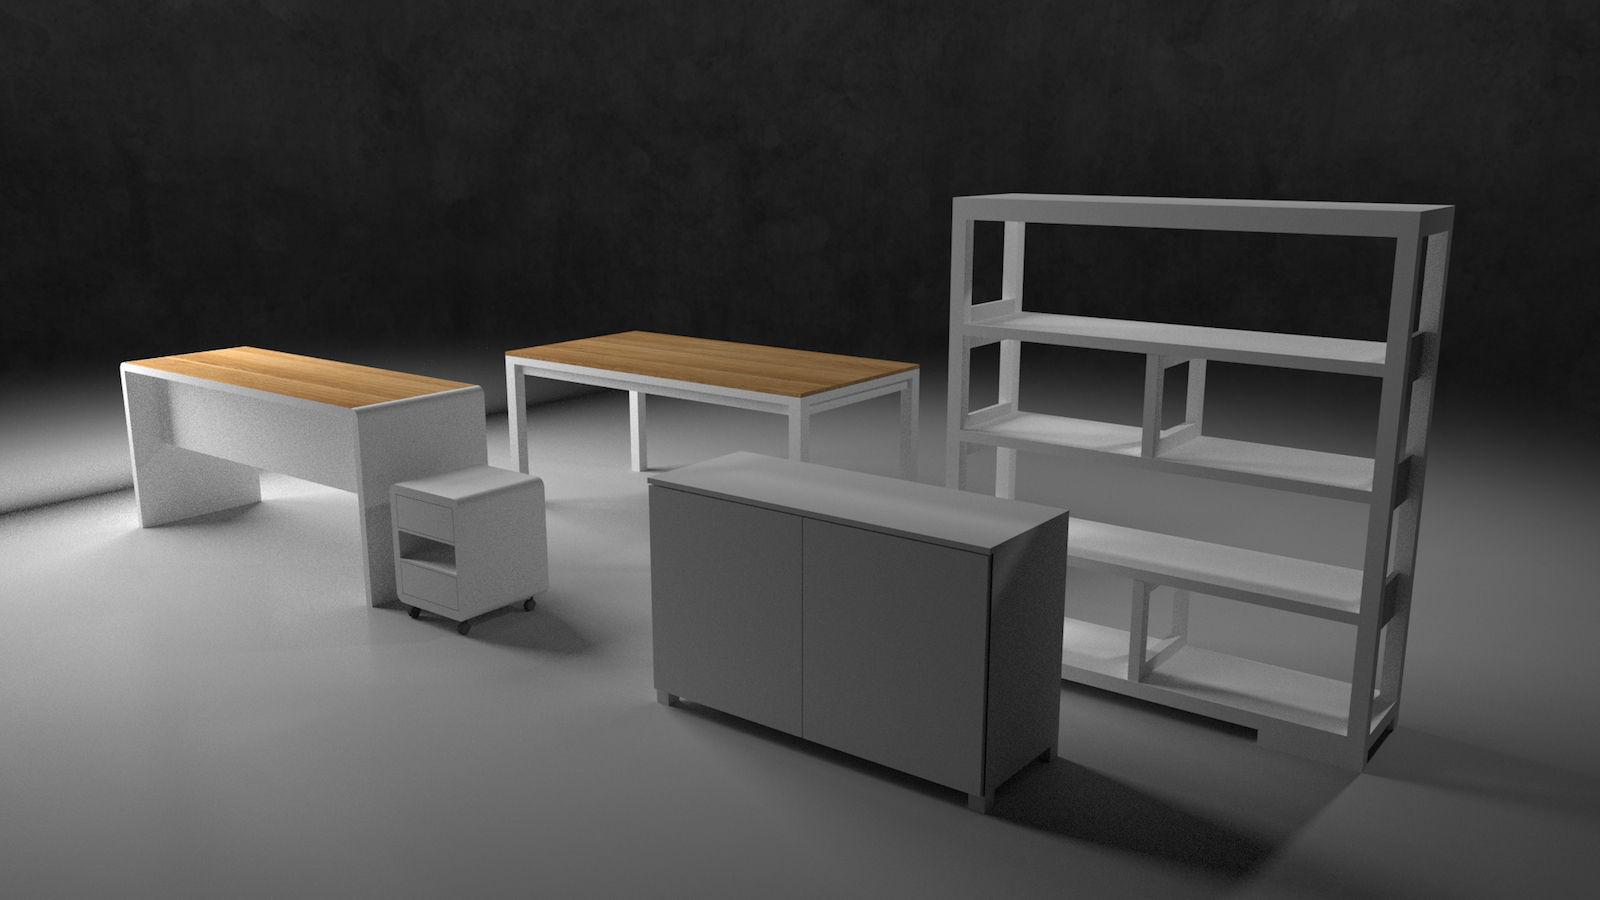 Office Furniture 2 Free 3d Model Skp